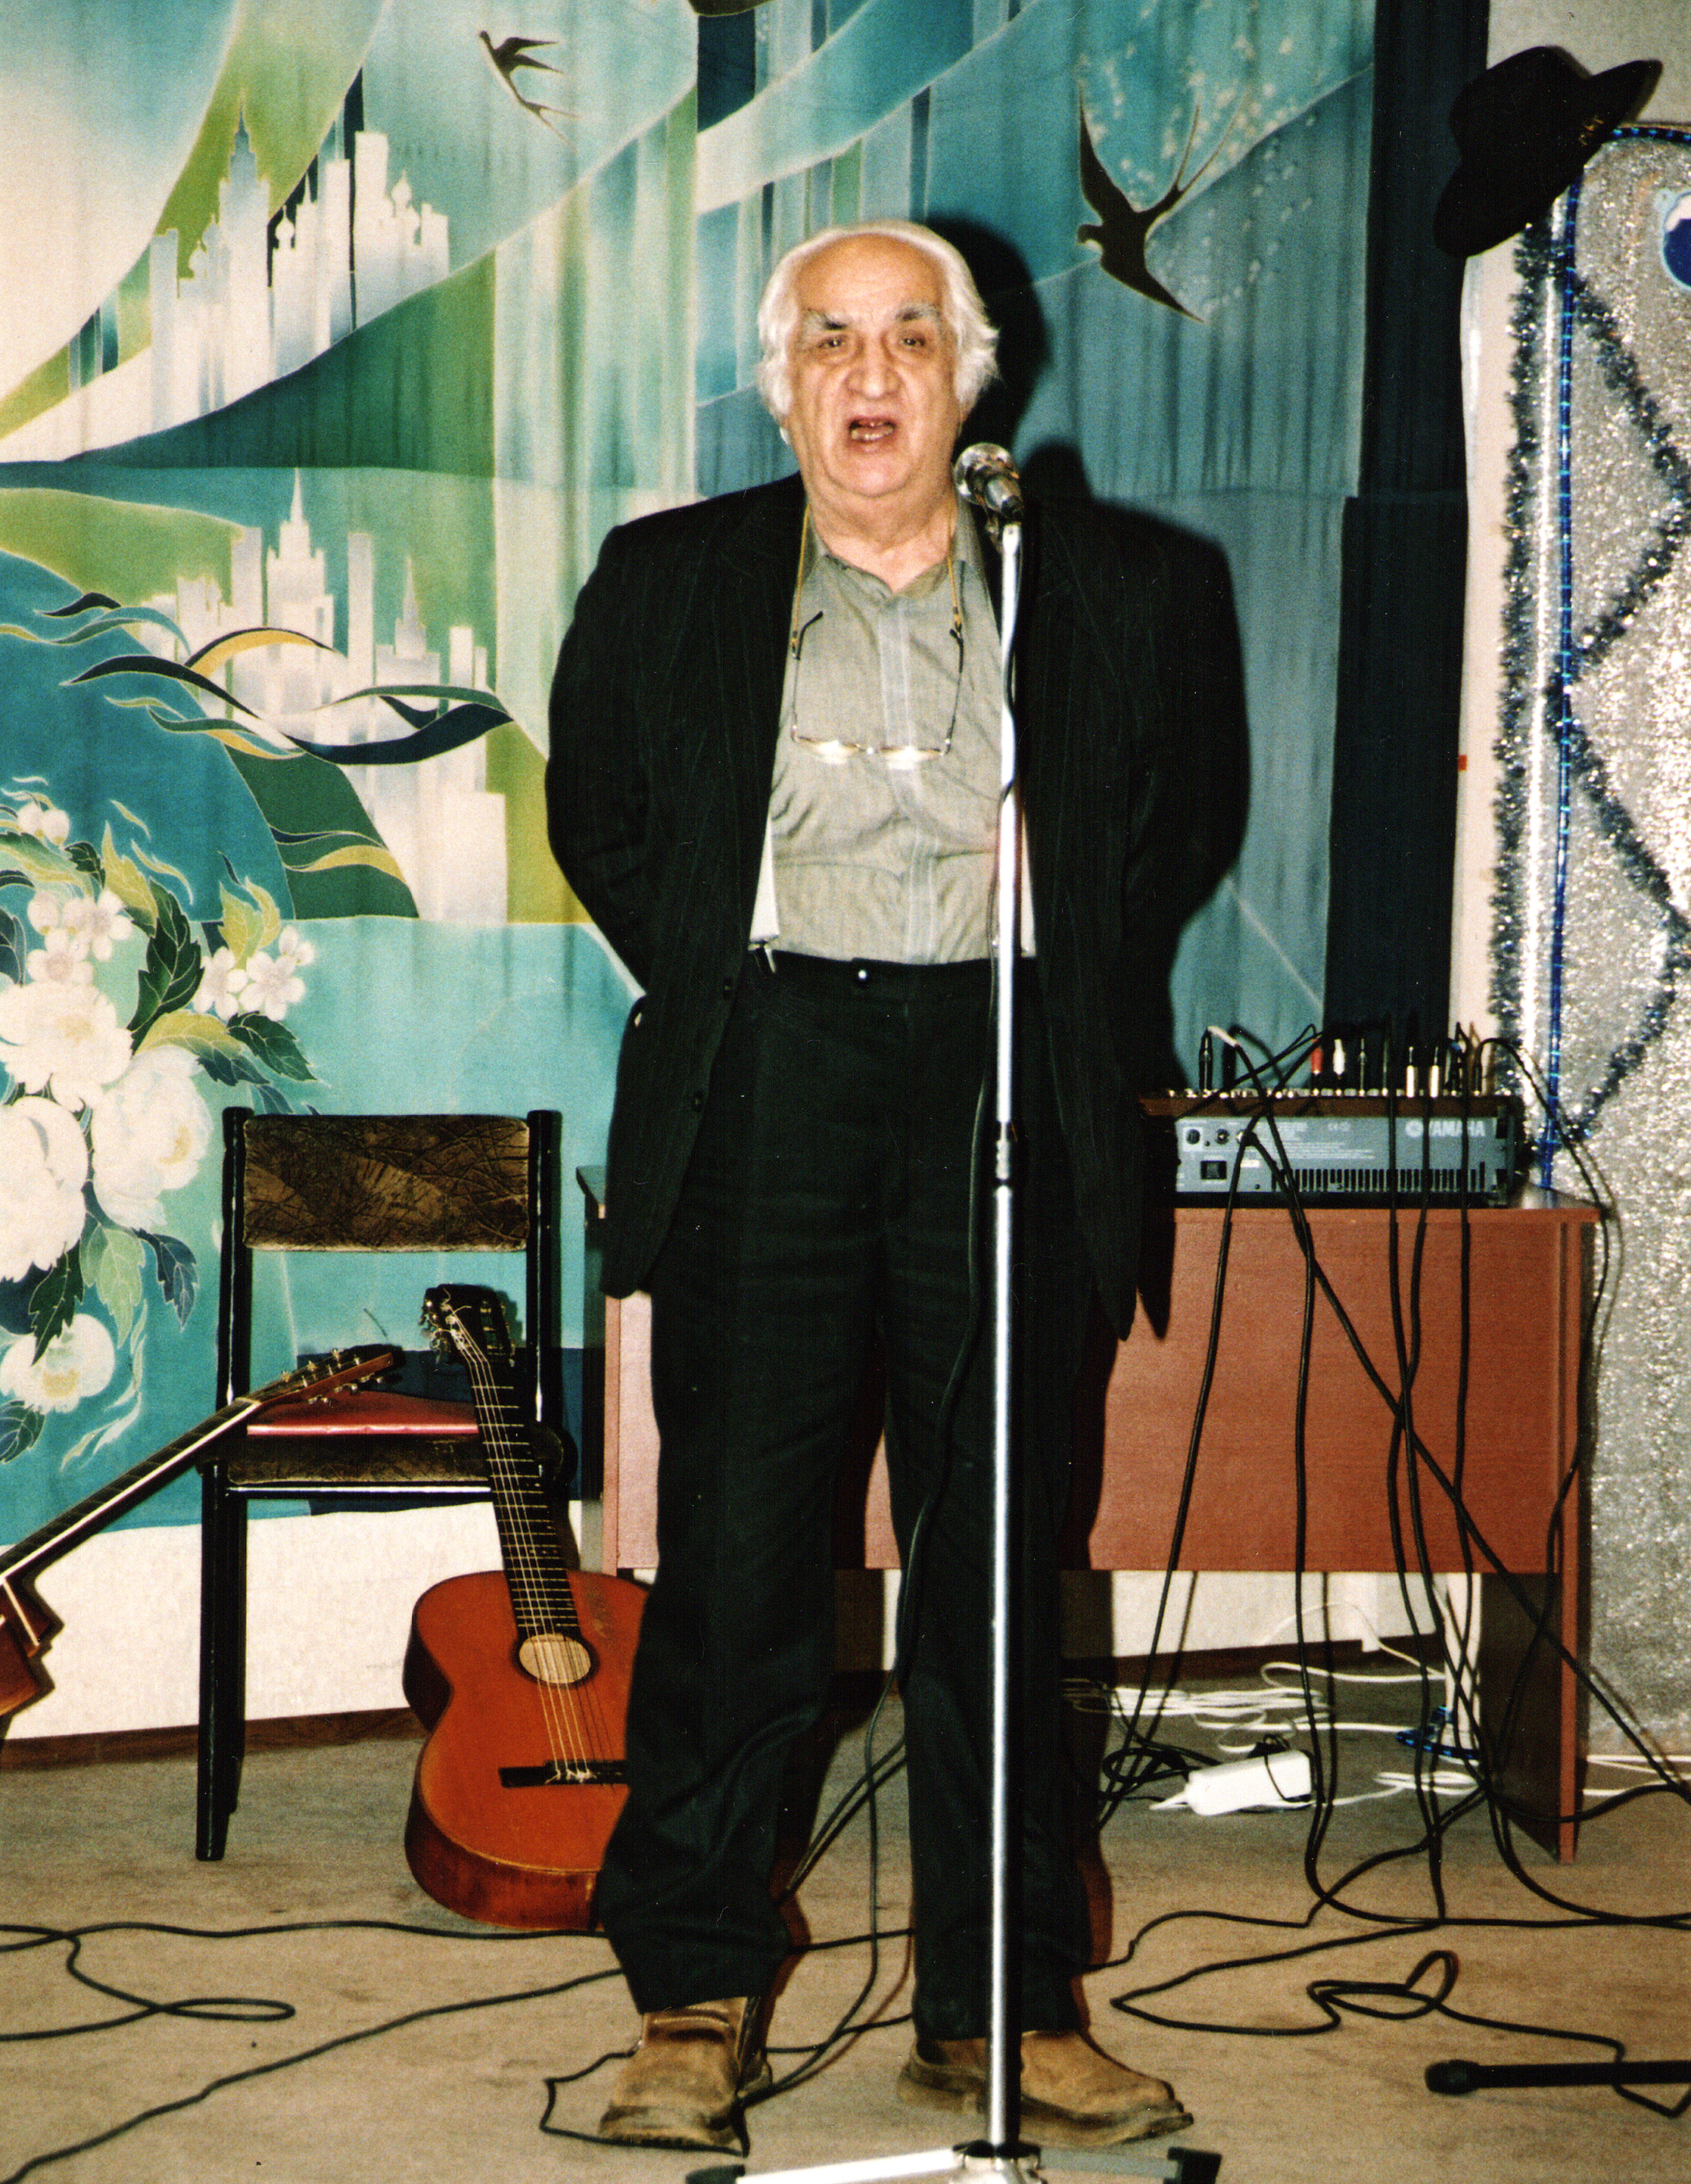 timofeevskiy-aleksandr-pavlovich-zh-zh-NU-2004